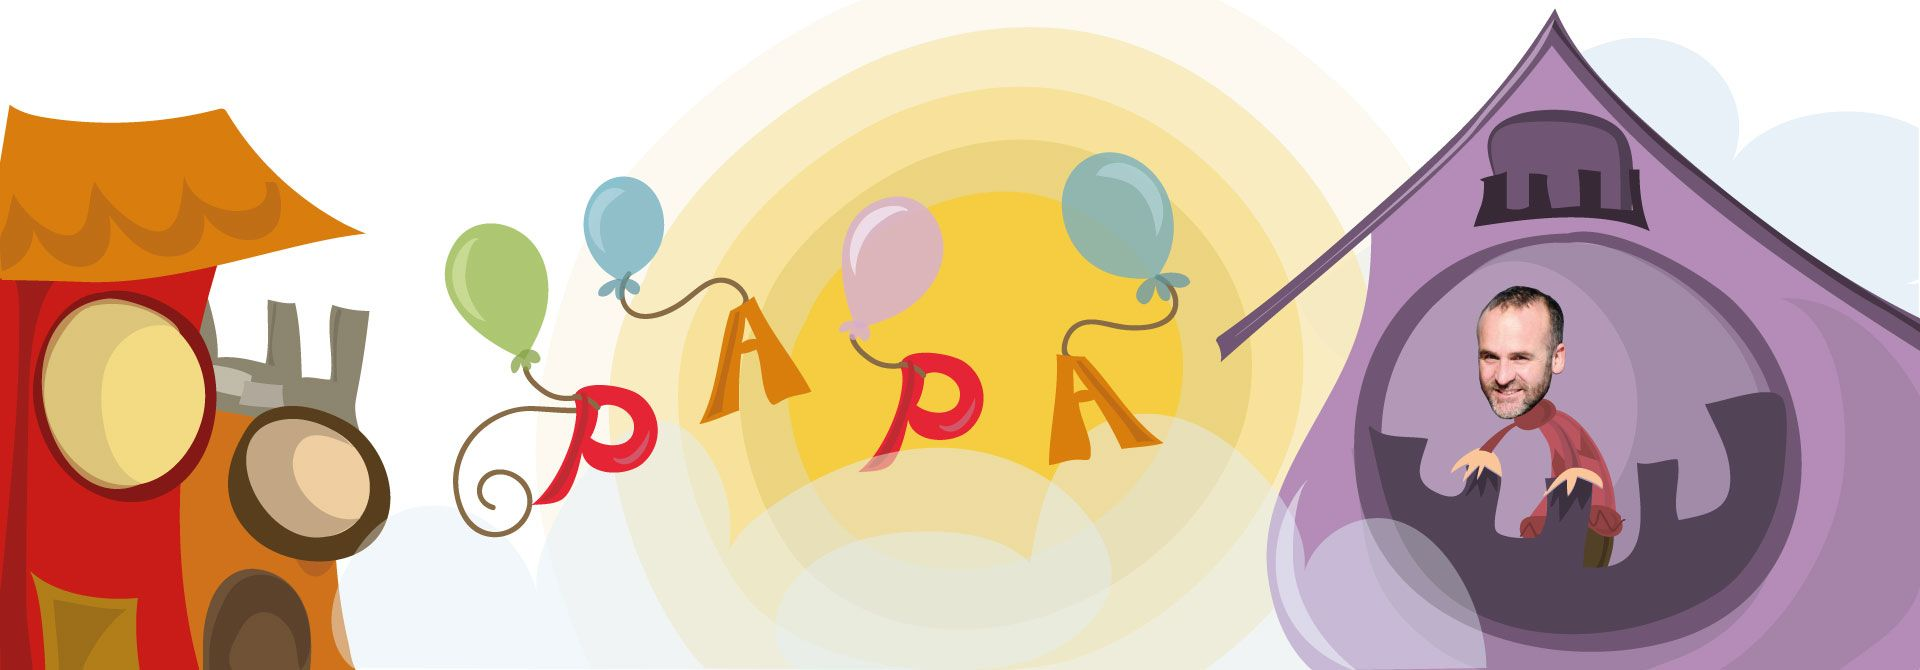 Día del padre - Kategorie - Kopfzeile